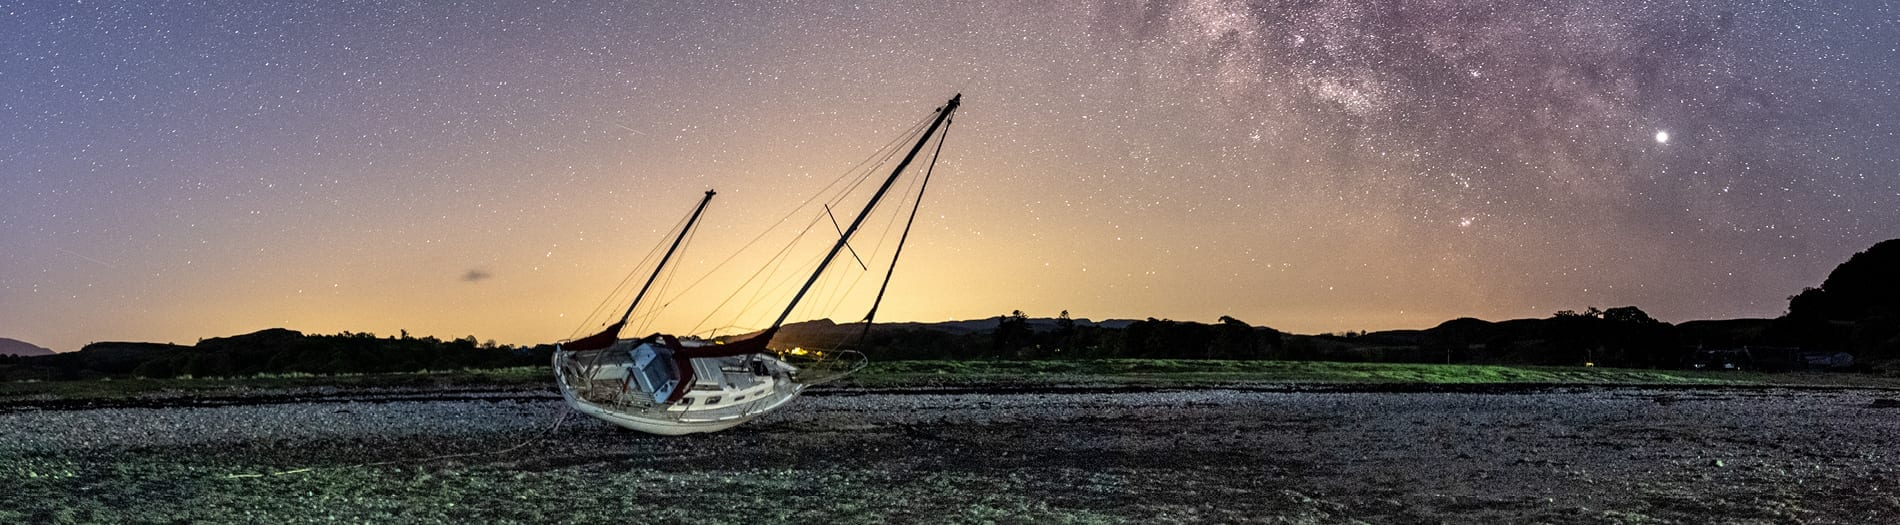 Starry skies at Loch Melfort Hotel